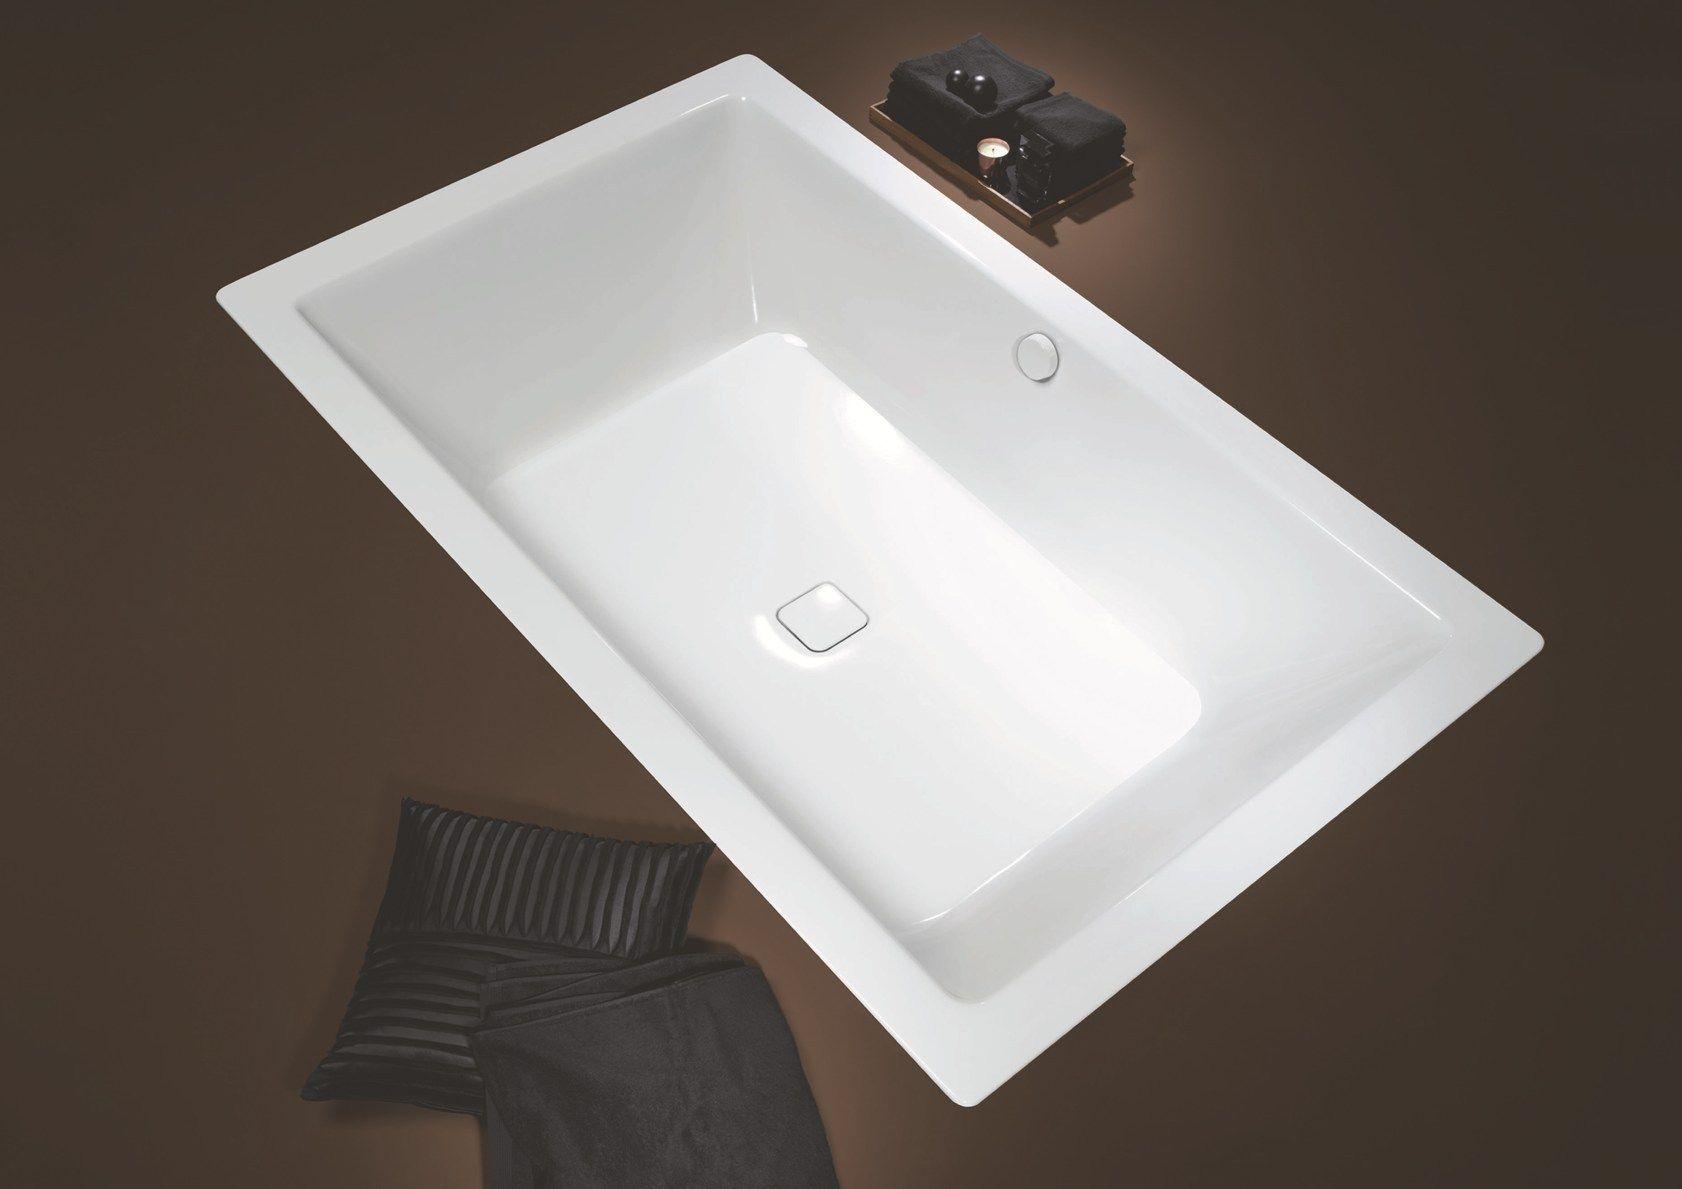 Vasca Da Bagno Kaldewei Dimensioni : Conopool di kaldewei: nuove dimensioni per il bagno